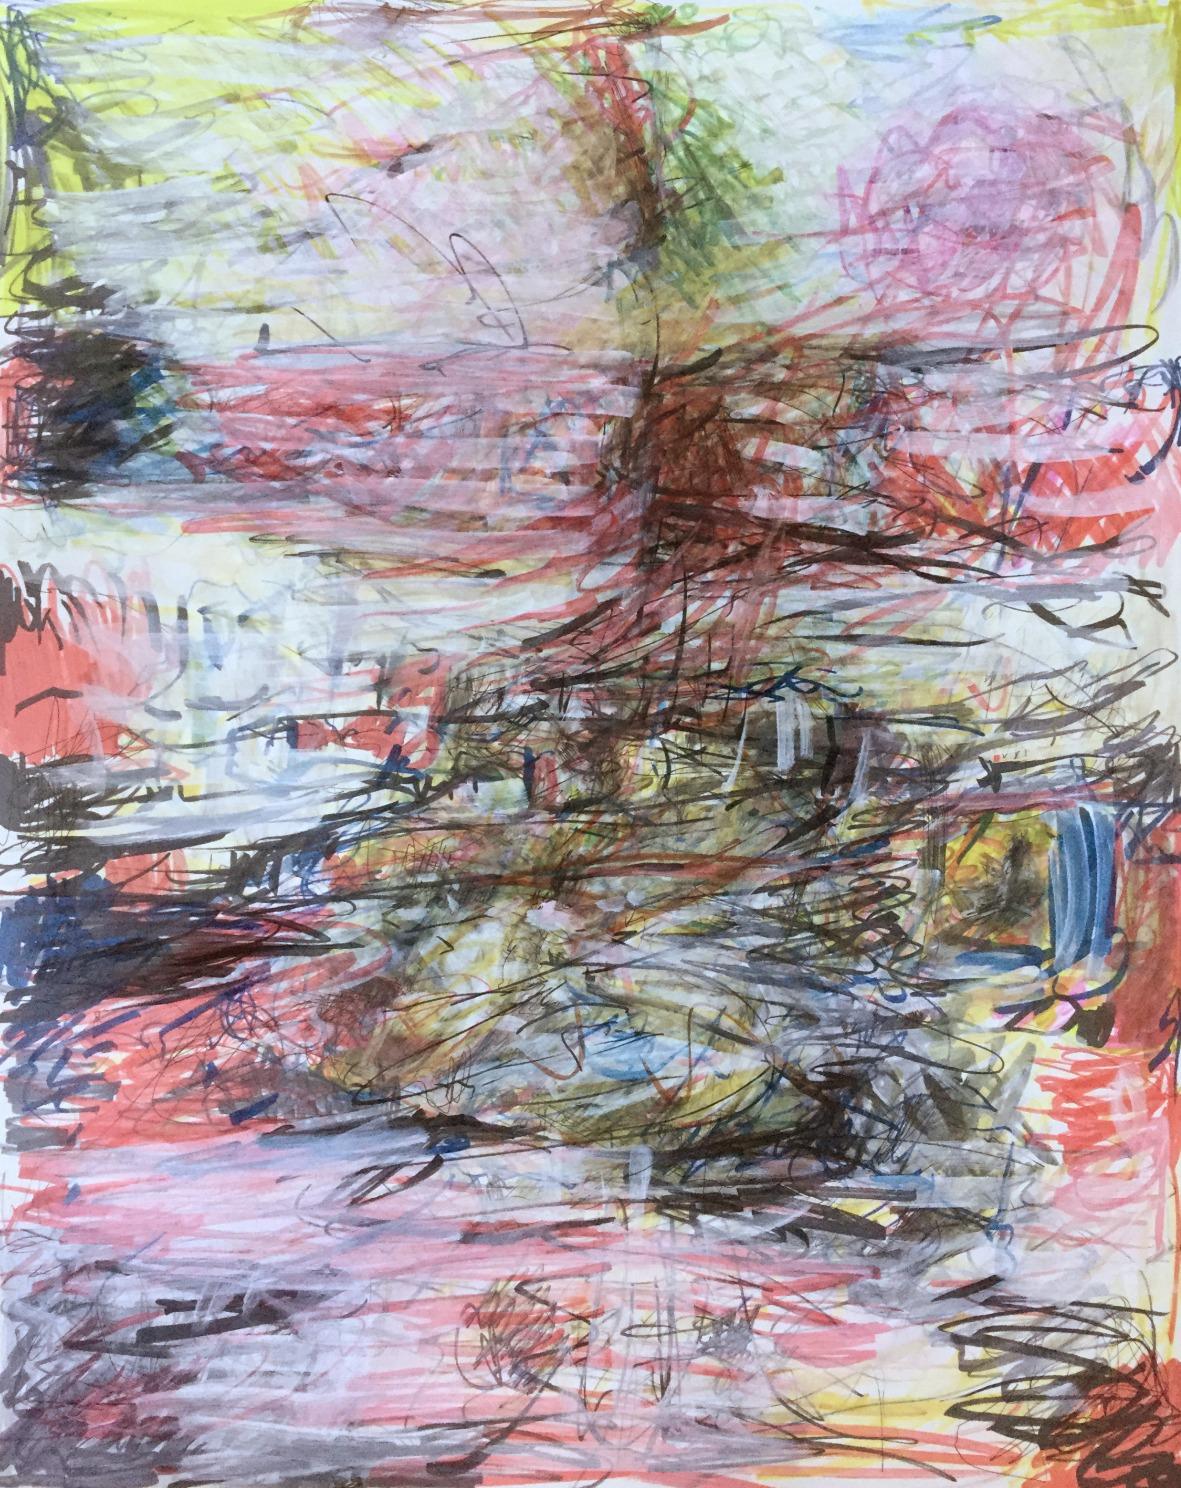 Untitled (657 8/16)